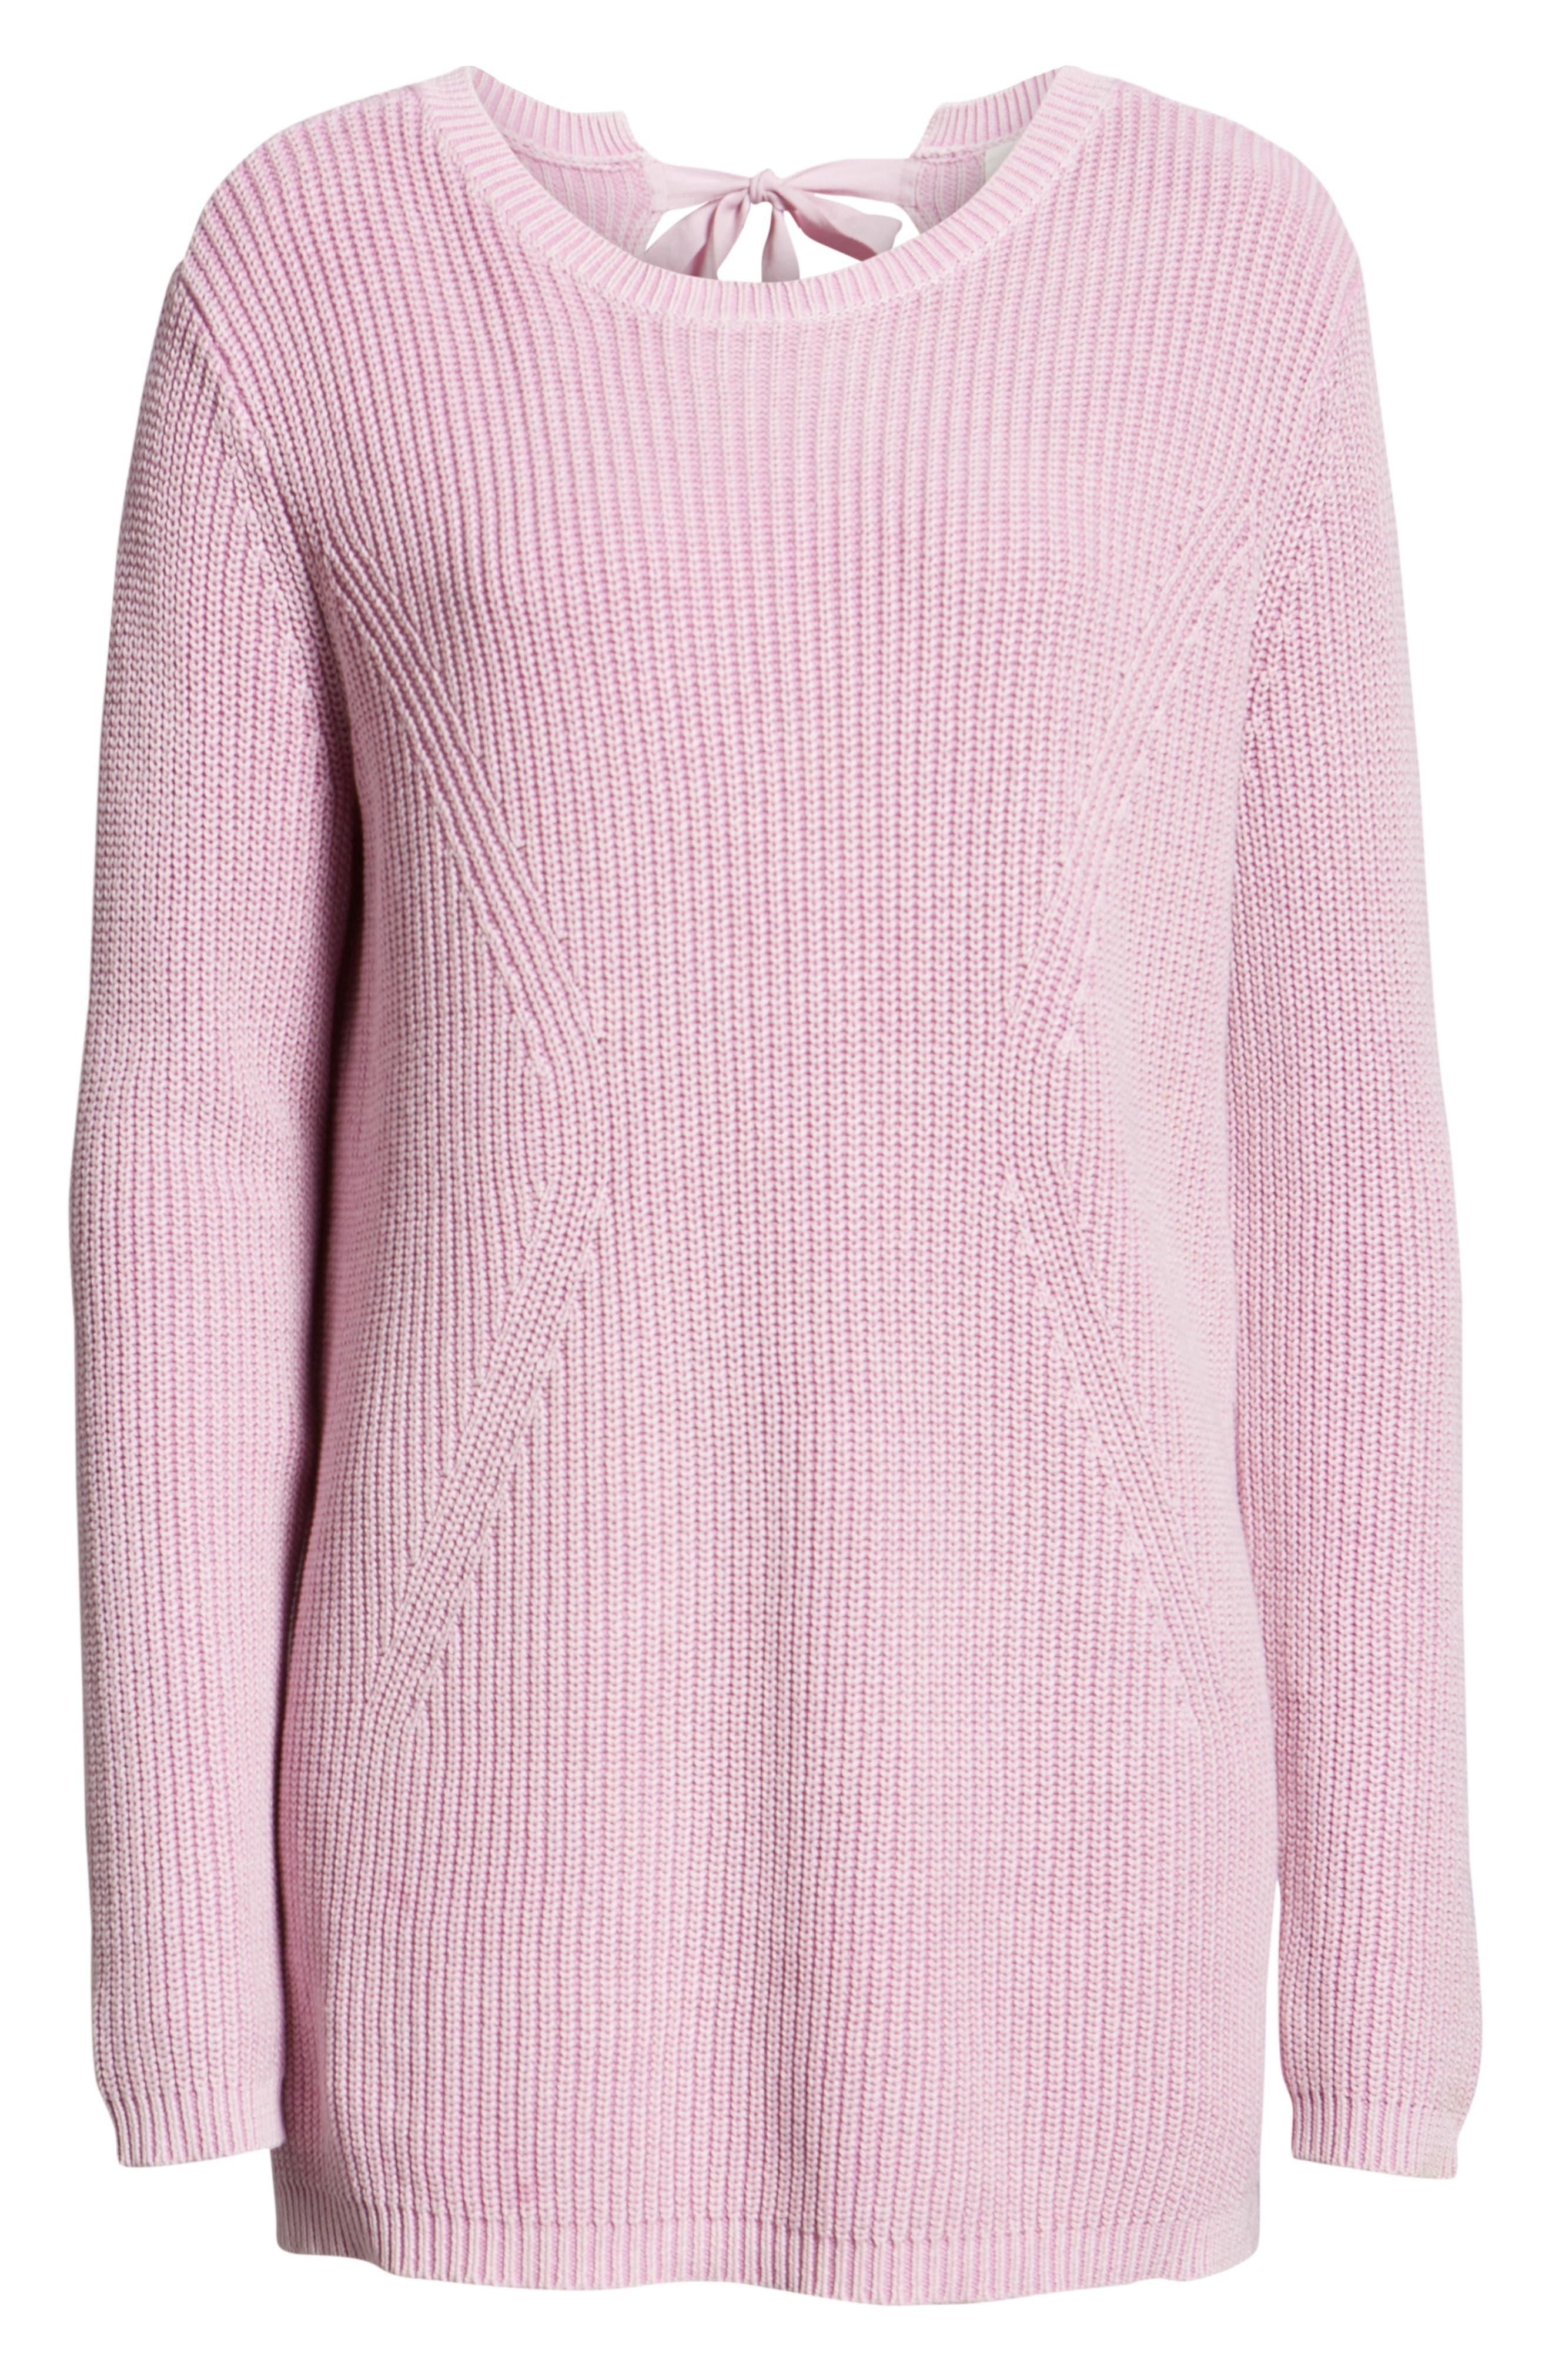 380c570a6a8713 Women s Sweaters